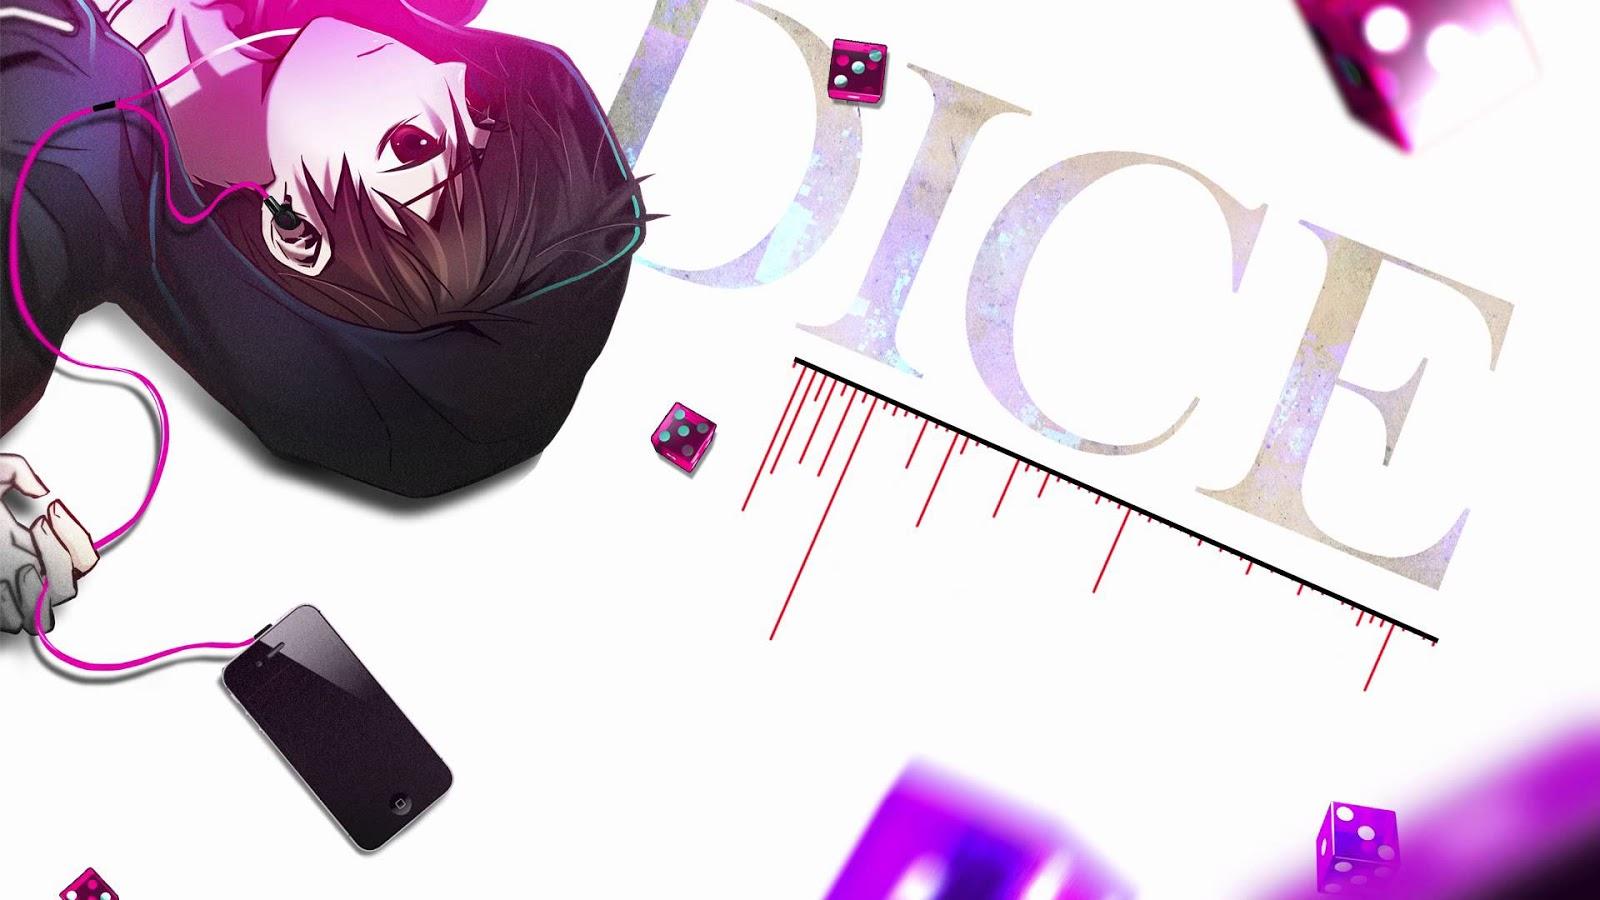 Dice Manga Webtoon Wallpaper